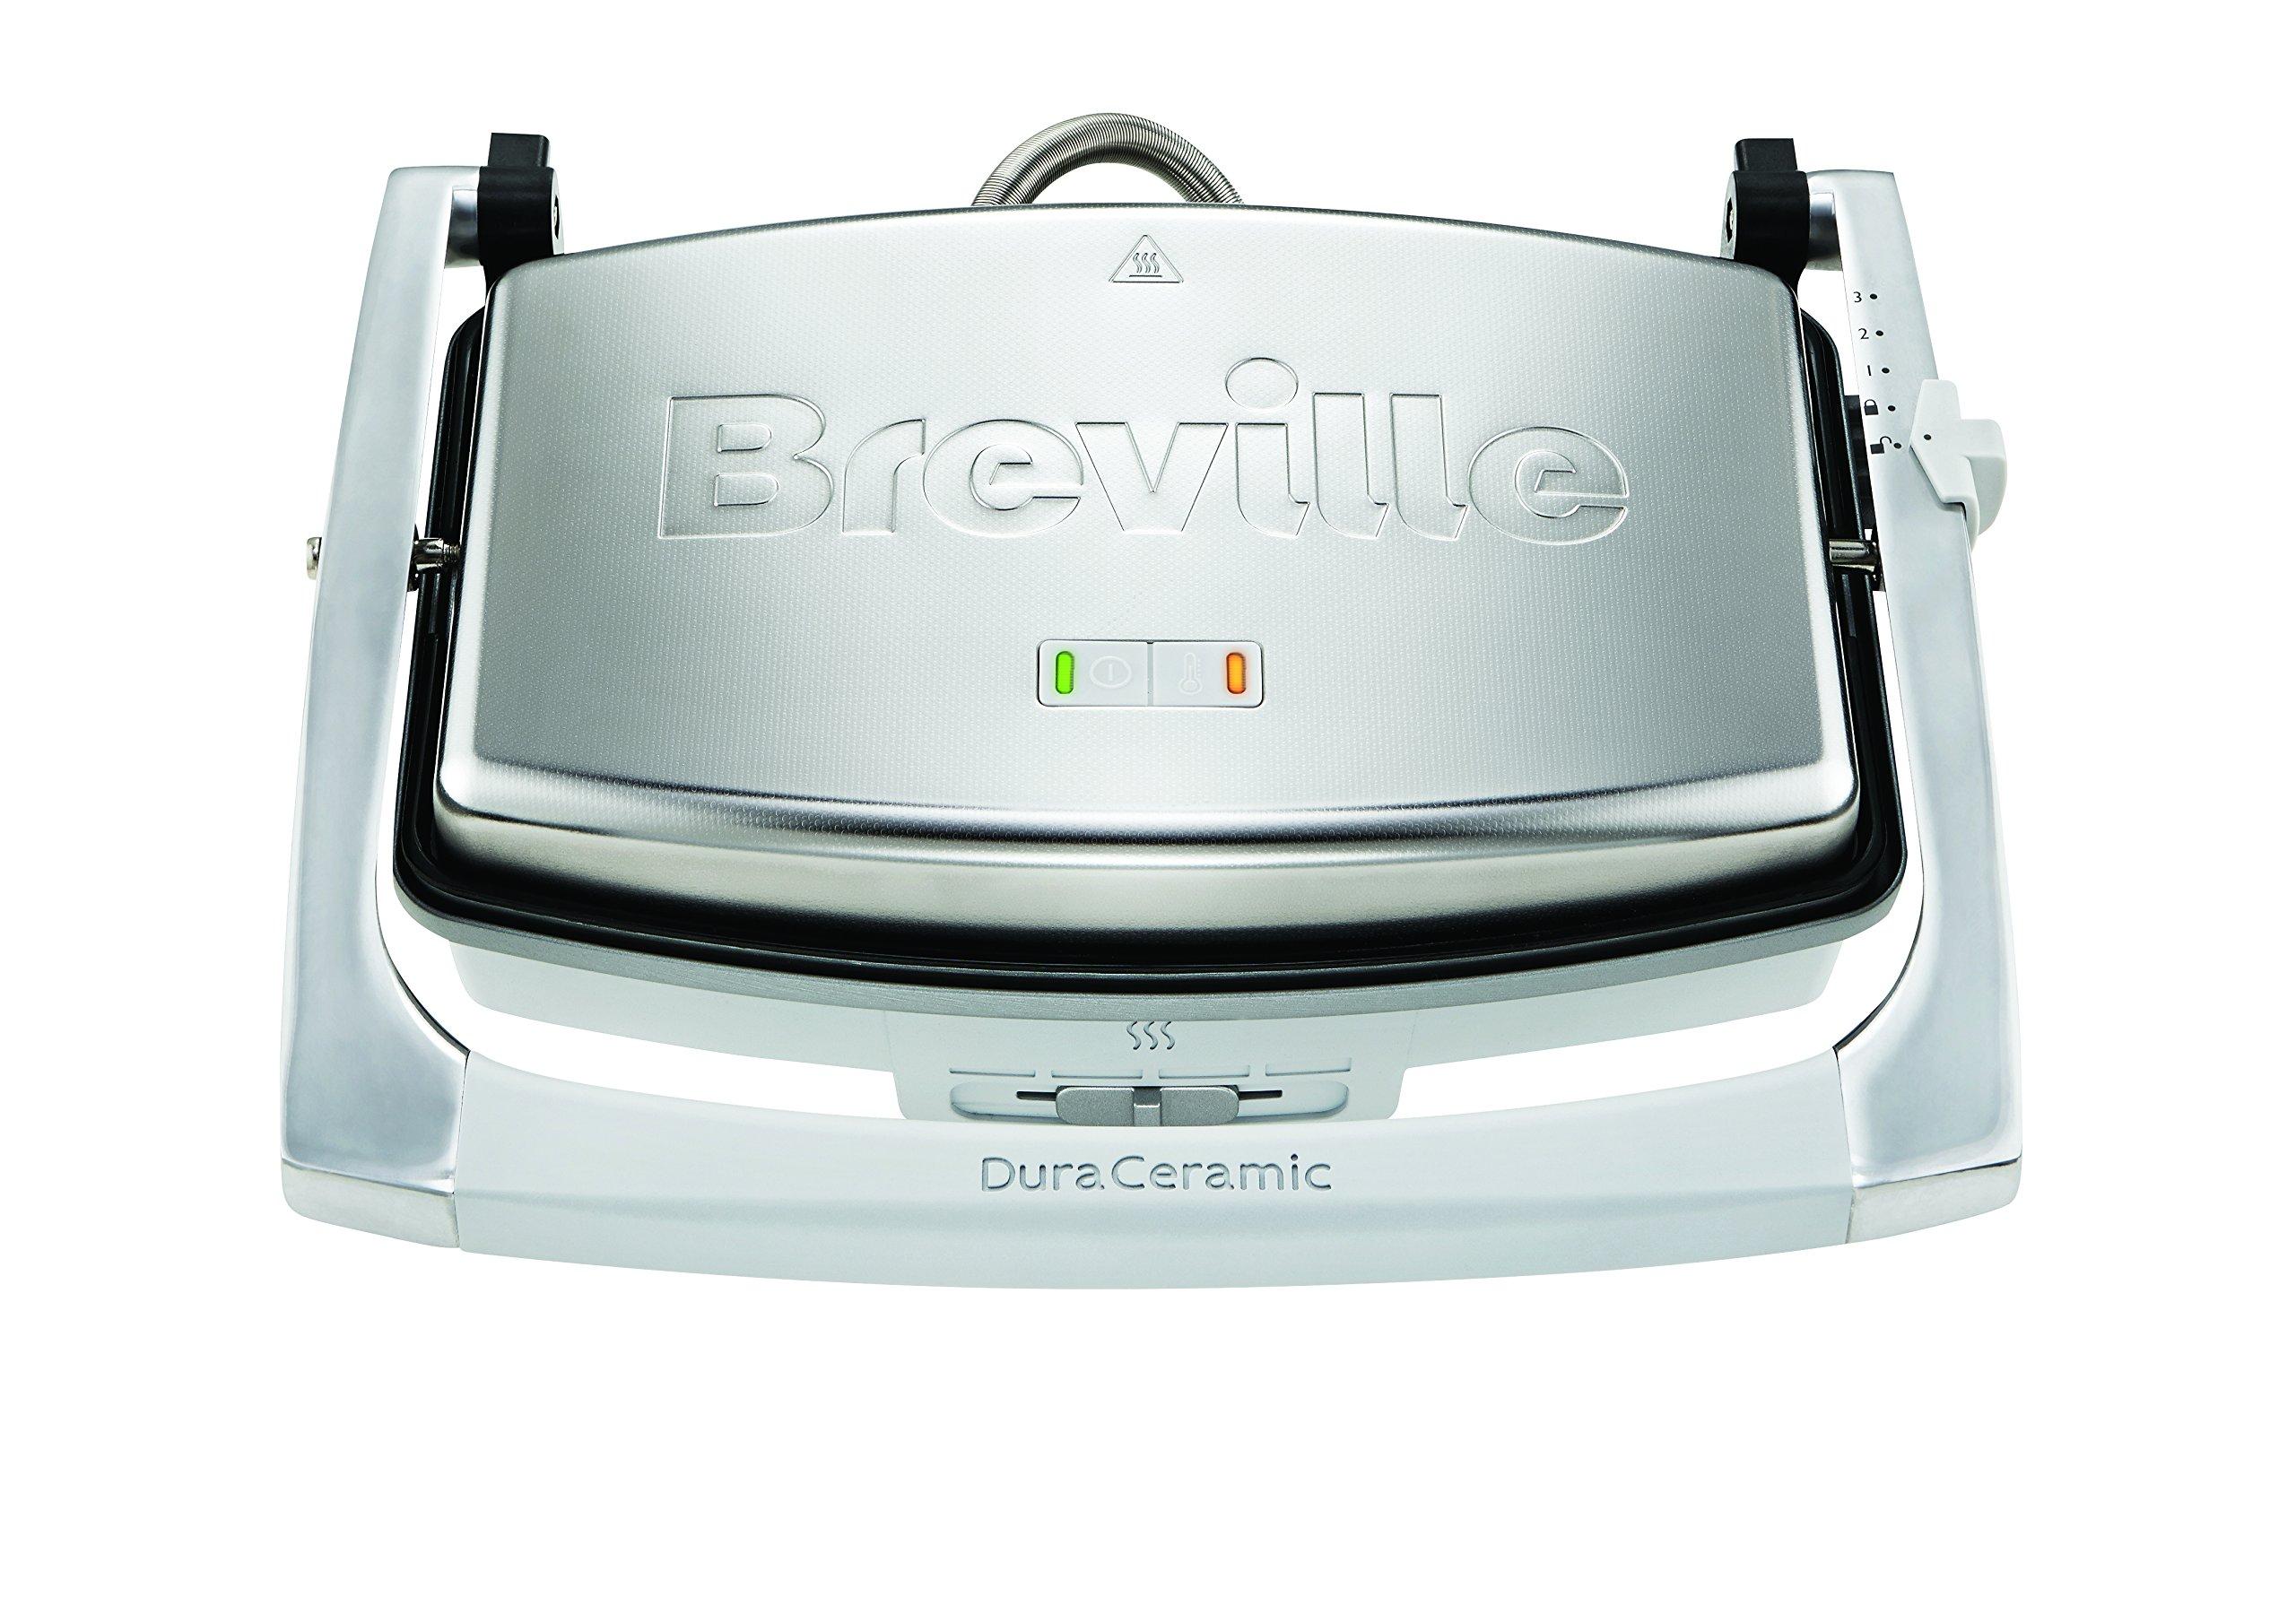 Breville VST071 Dura Ceramic Sandwich Press,Light Grey